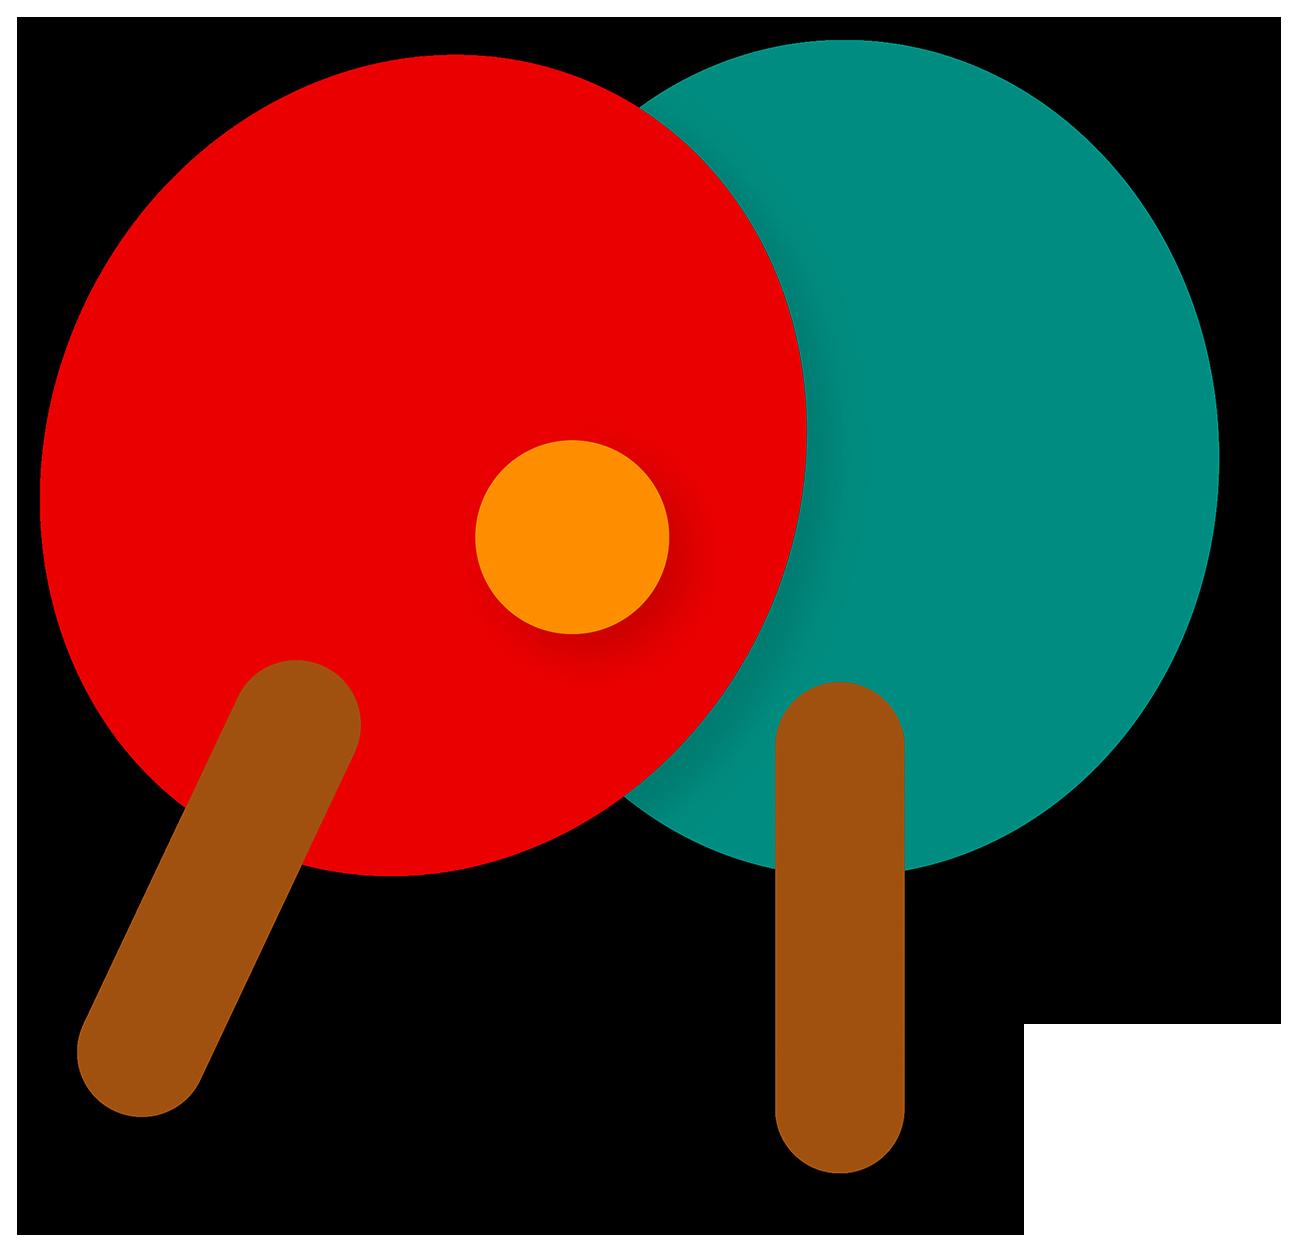 Clipart table circle table. Tennis racket clip art